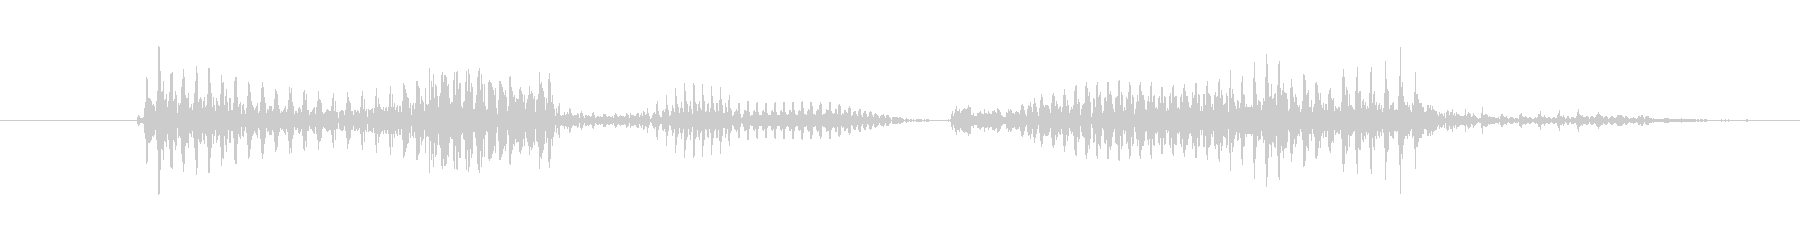 「11 PM」英語発音の未再生の波形